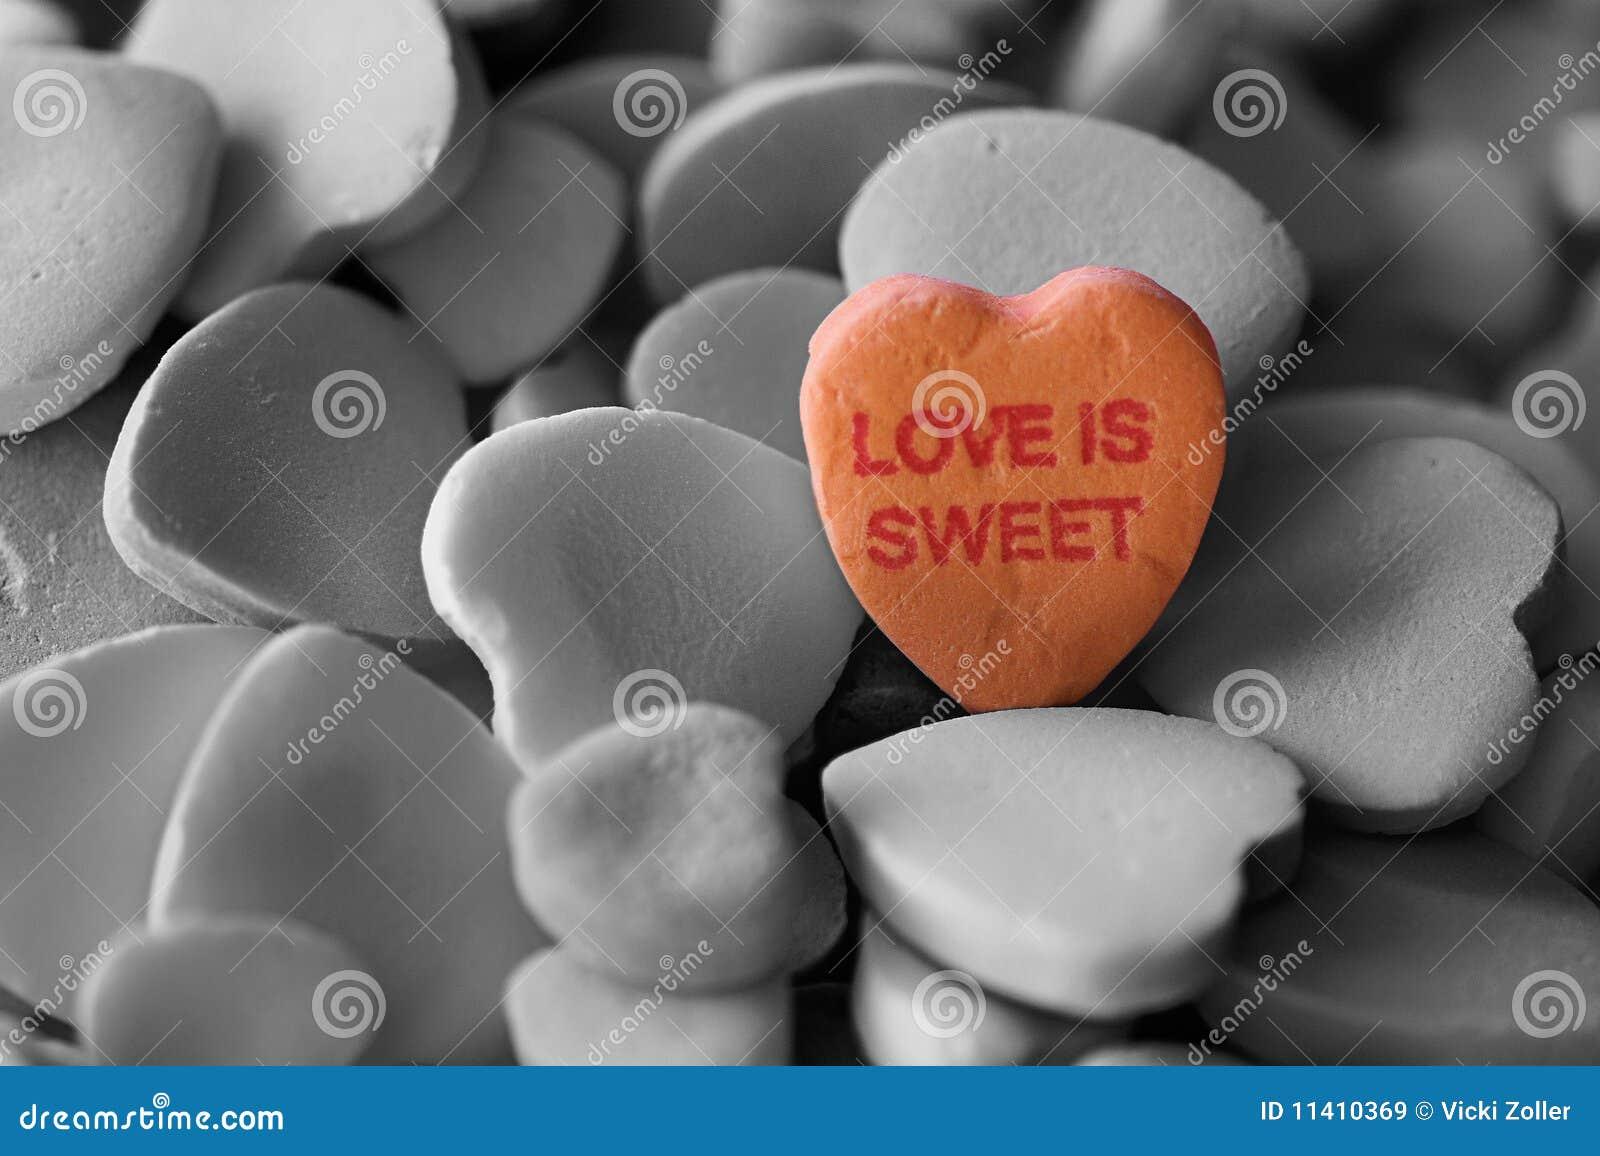 officermcg so sweet love - 800×533